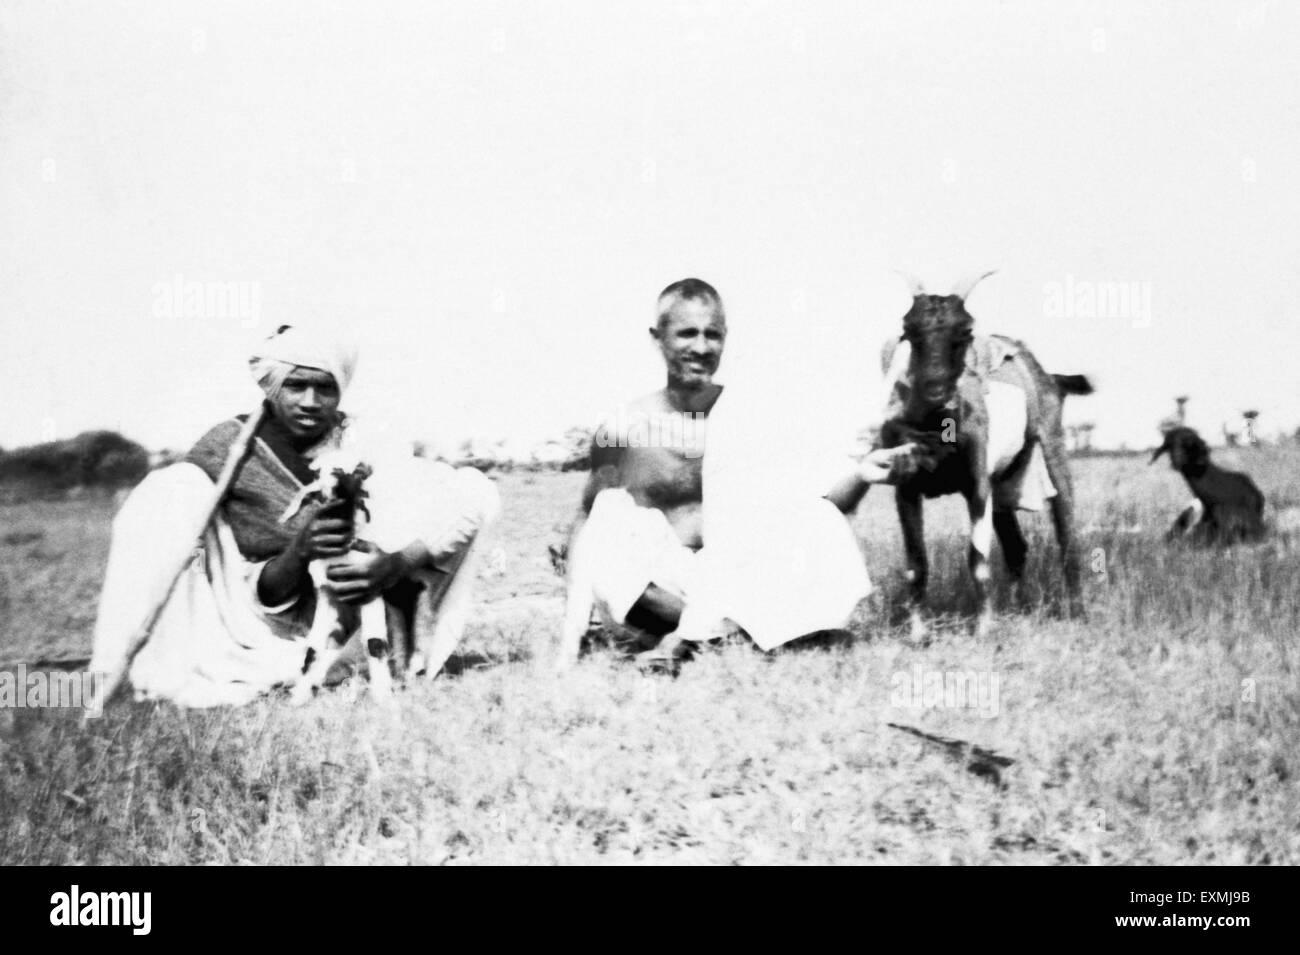 Balwant Singh on the fields of Sevagram Ashram ; 1940 NO MR - Stock Image